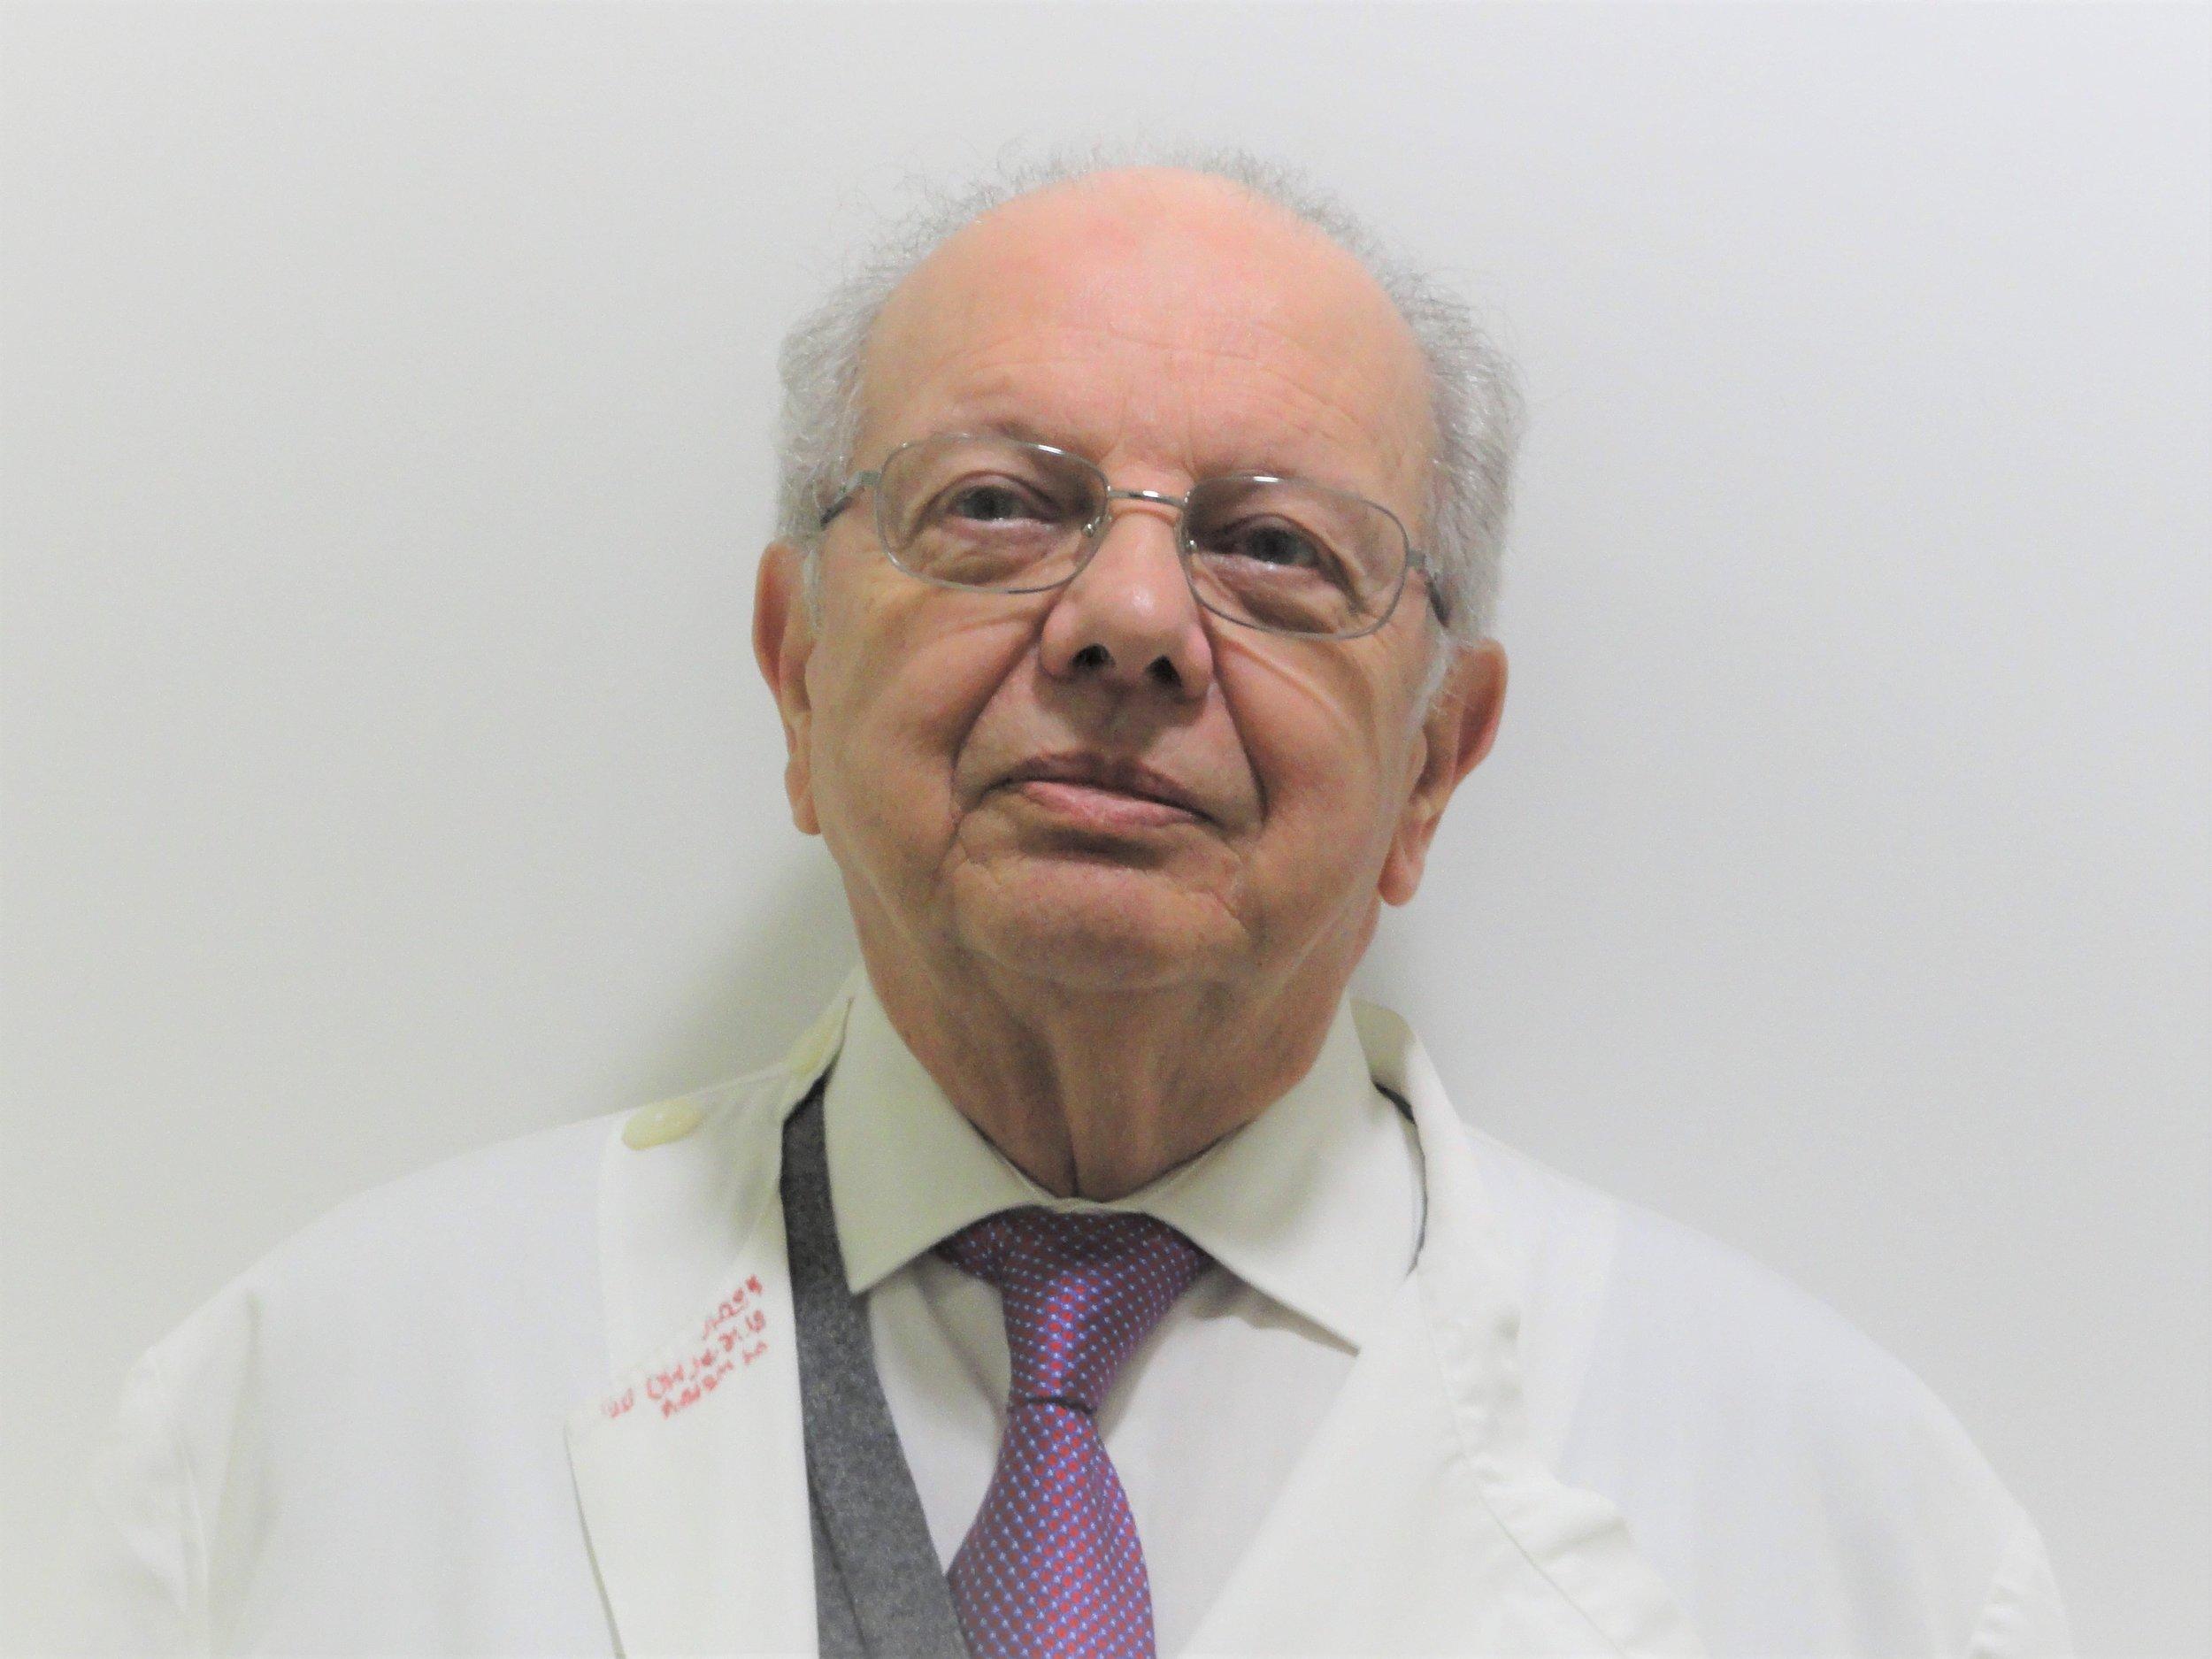 Prof. Bugalho Almeida copia - Pneumologia.jpg